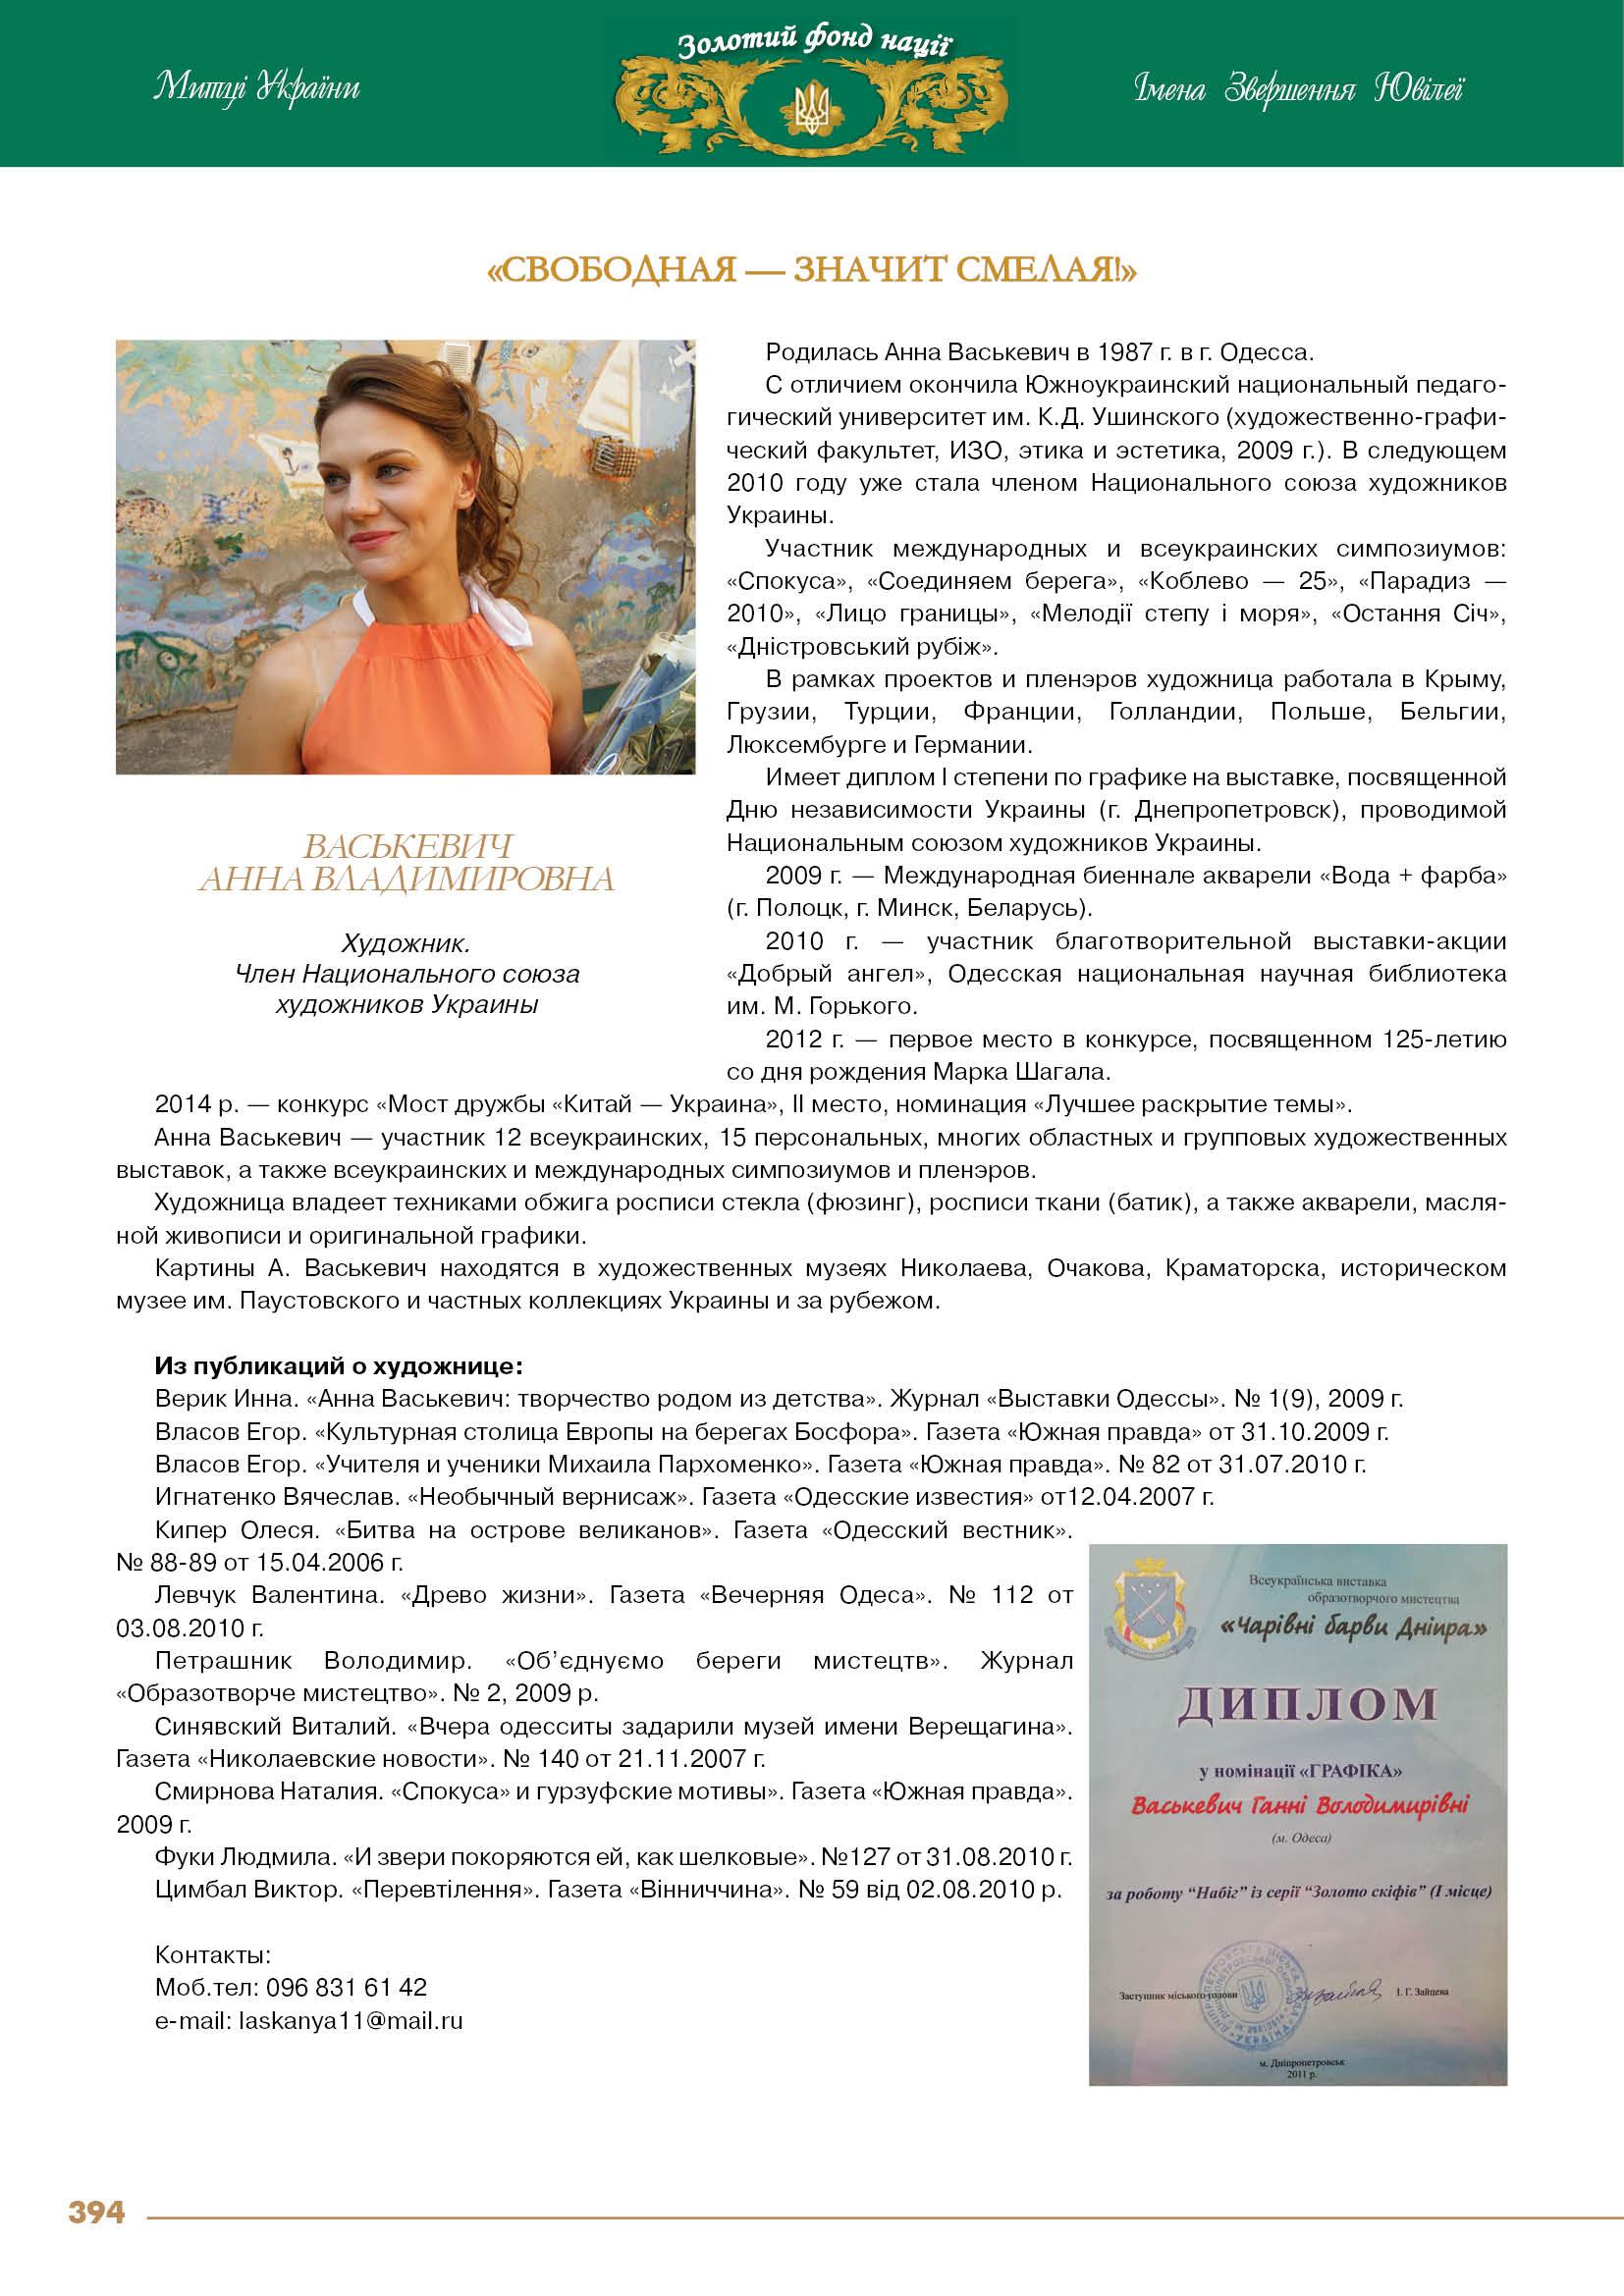 Васькевич Анна Владимировна